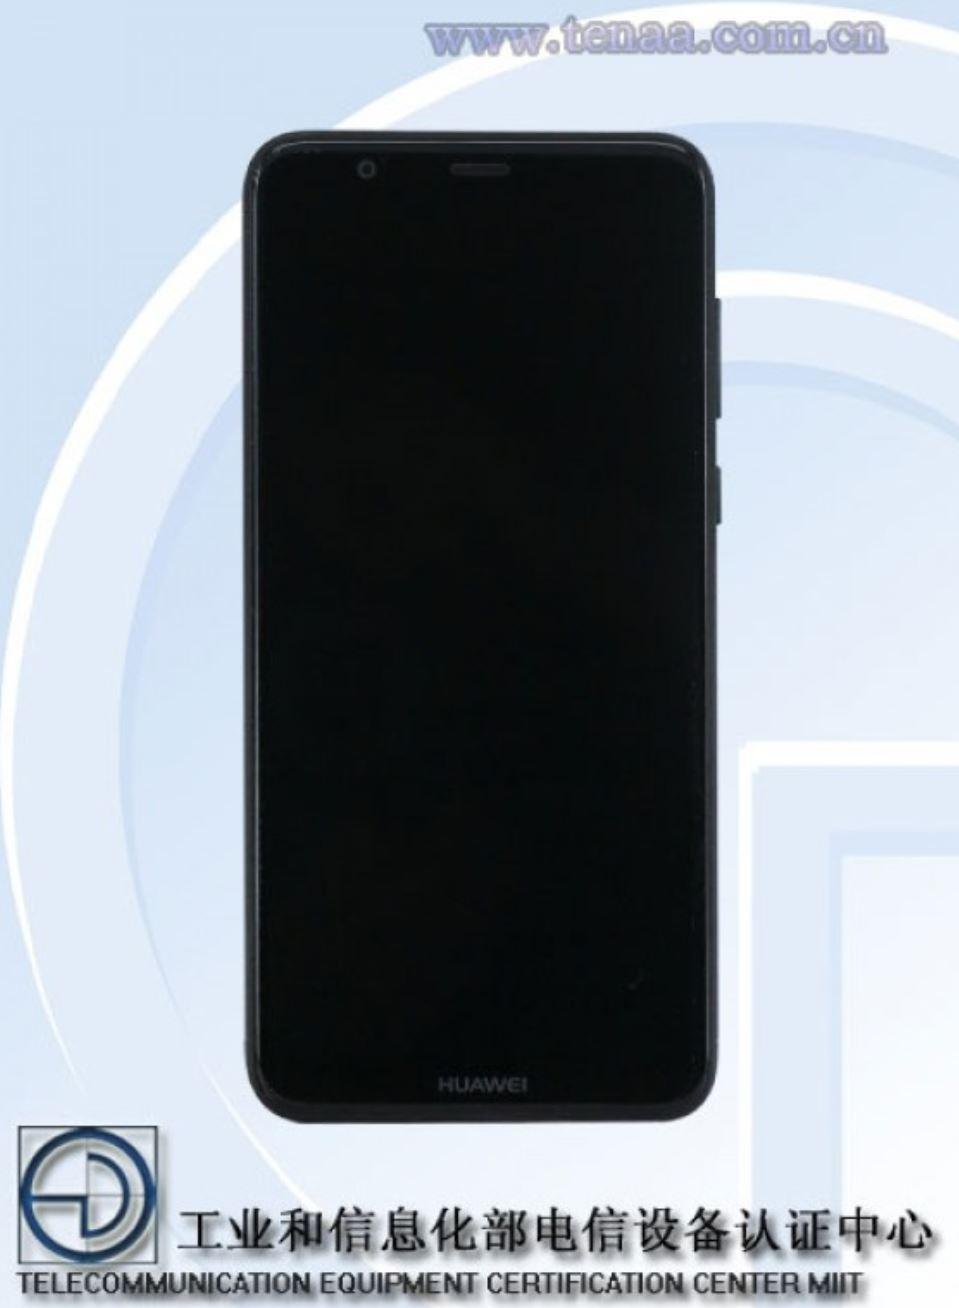 Huawei phone that appeared on TENAA